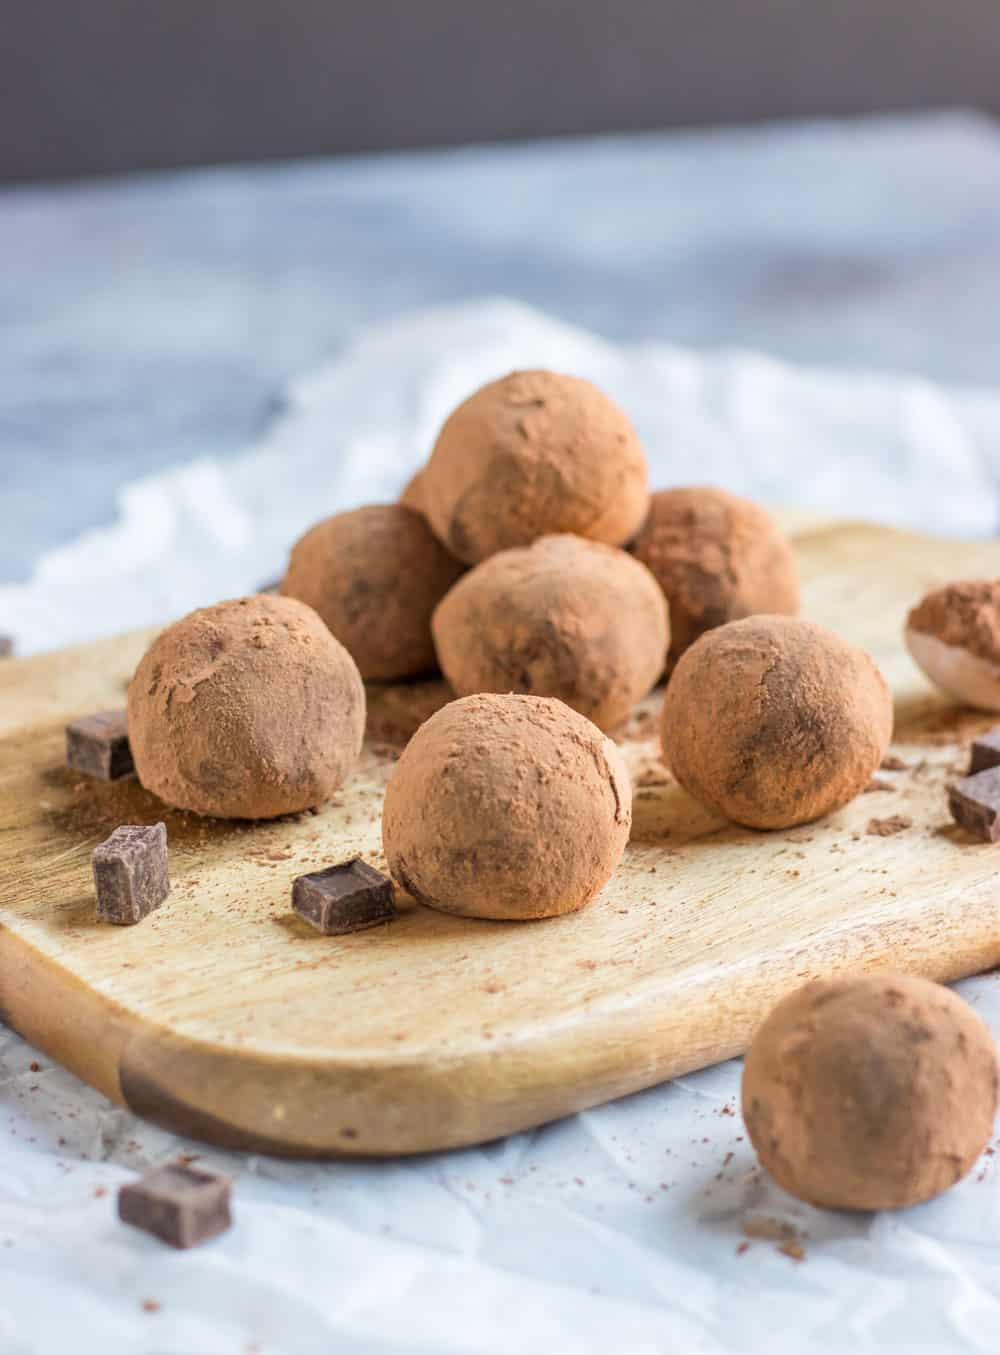 Cocoa dusted amaretto truffles on wood board